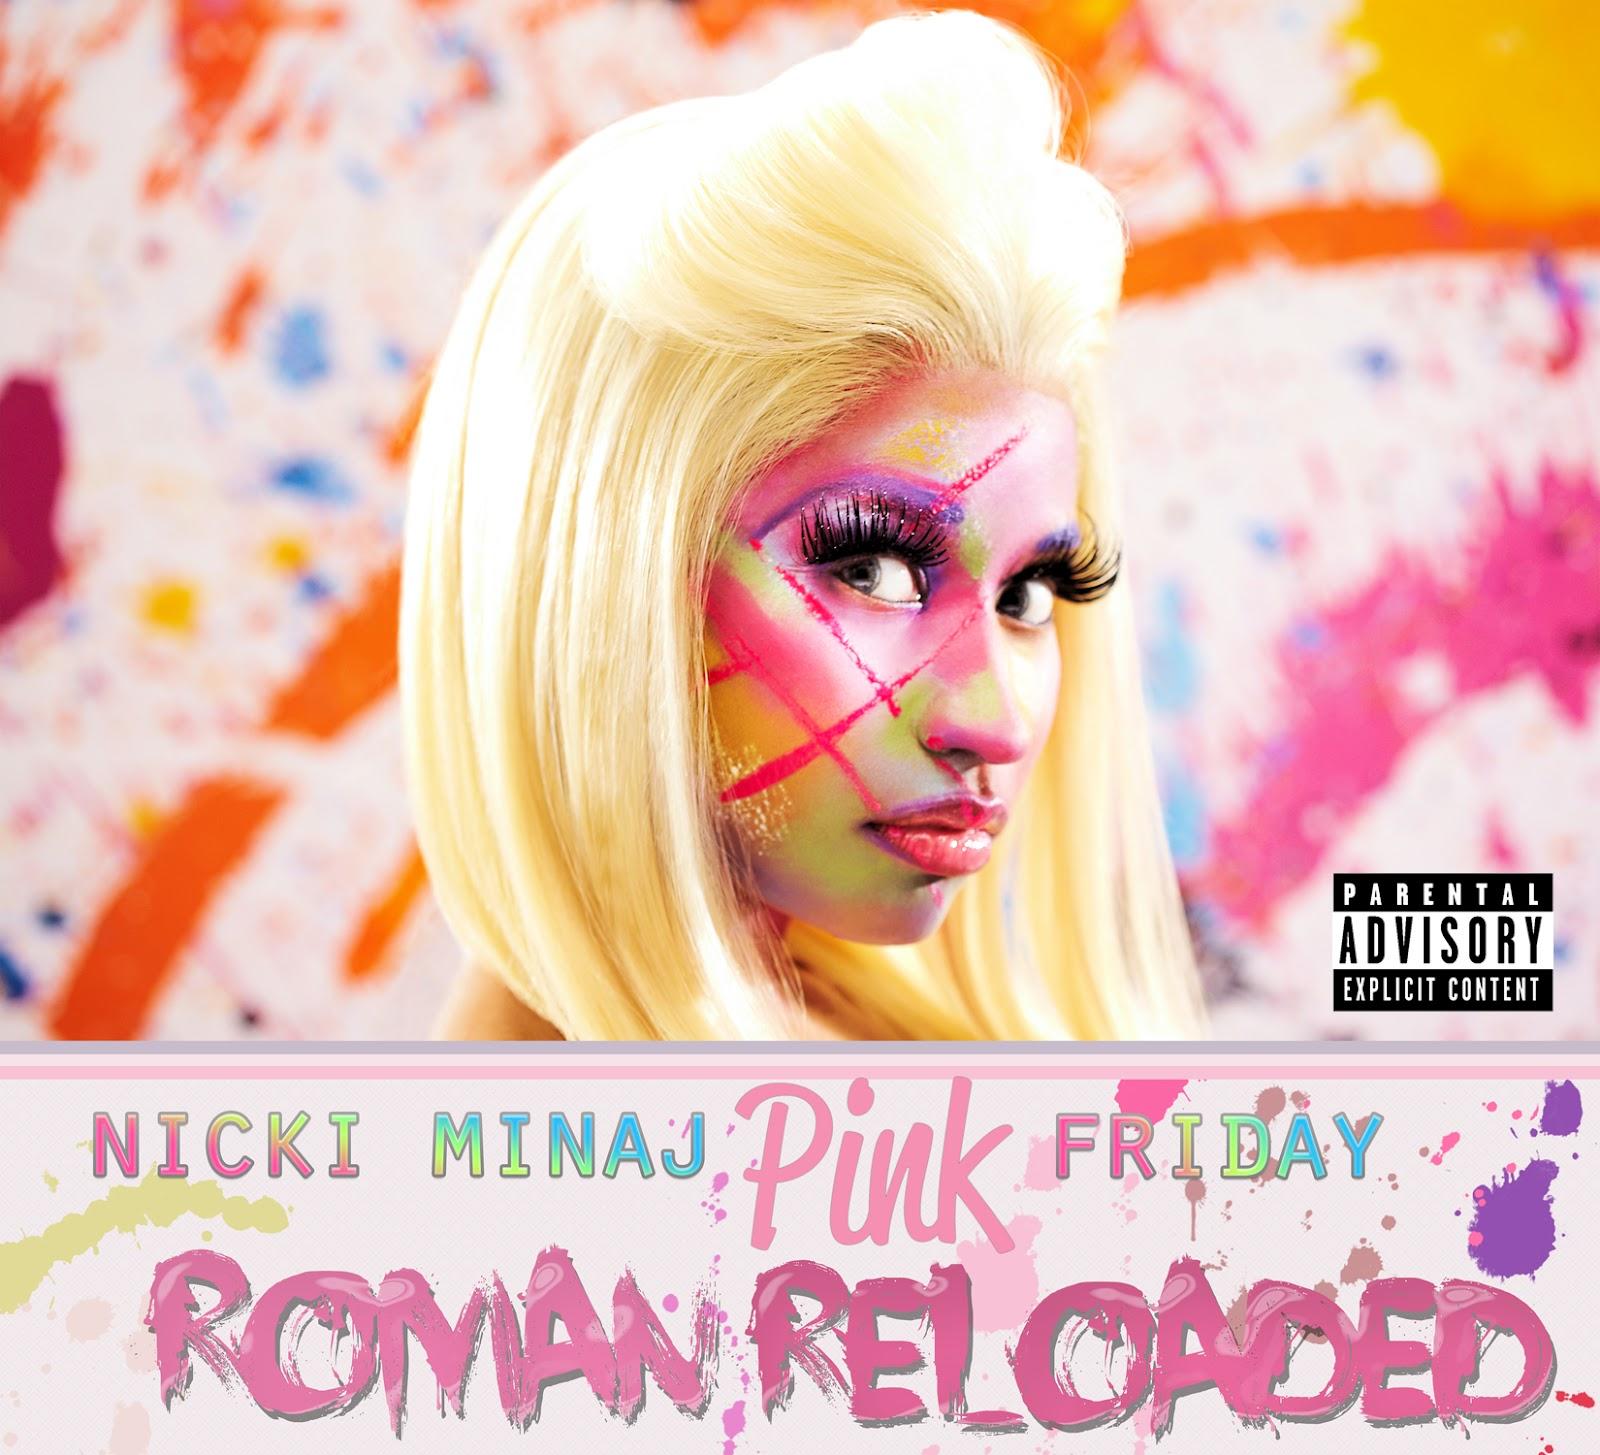 http://1.bp.blogspot.com/-nw8UKhyS6Pw/T8o3mz2jmUI/AAAAAAAABgc/OuVdcRavk7U/s1600/NickiMinaj-PinkFridayRomanReloaded_cover.jpeg